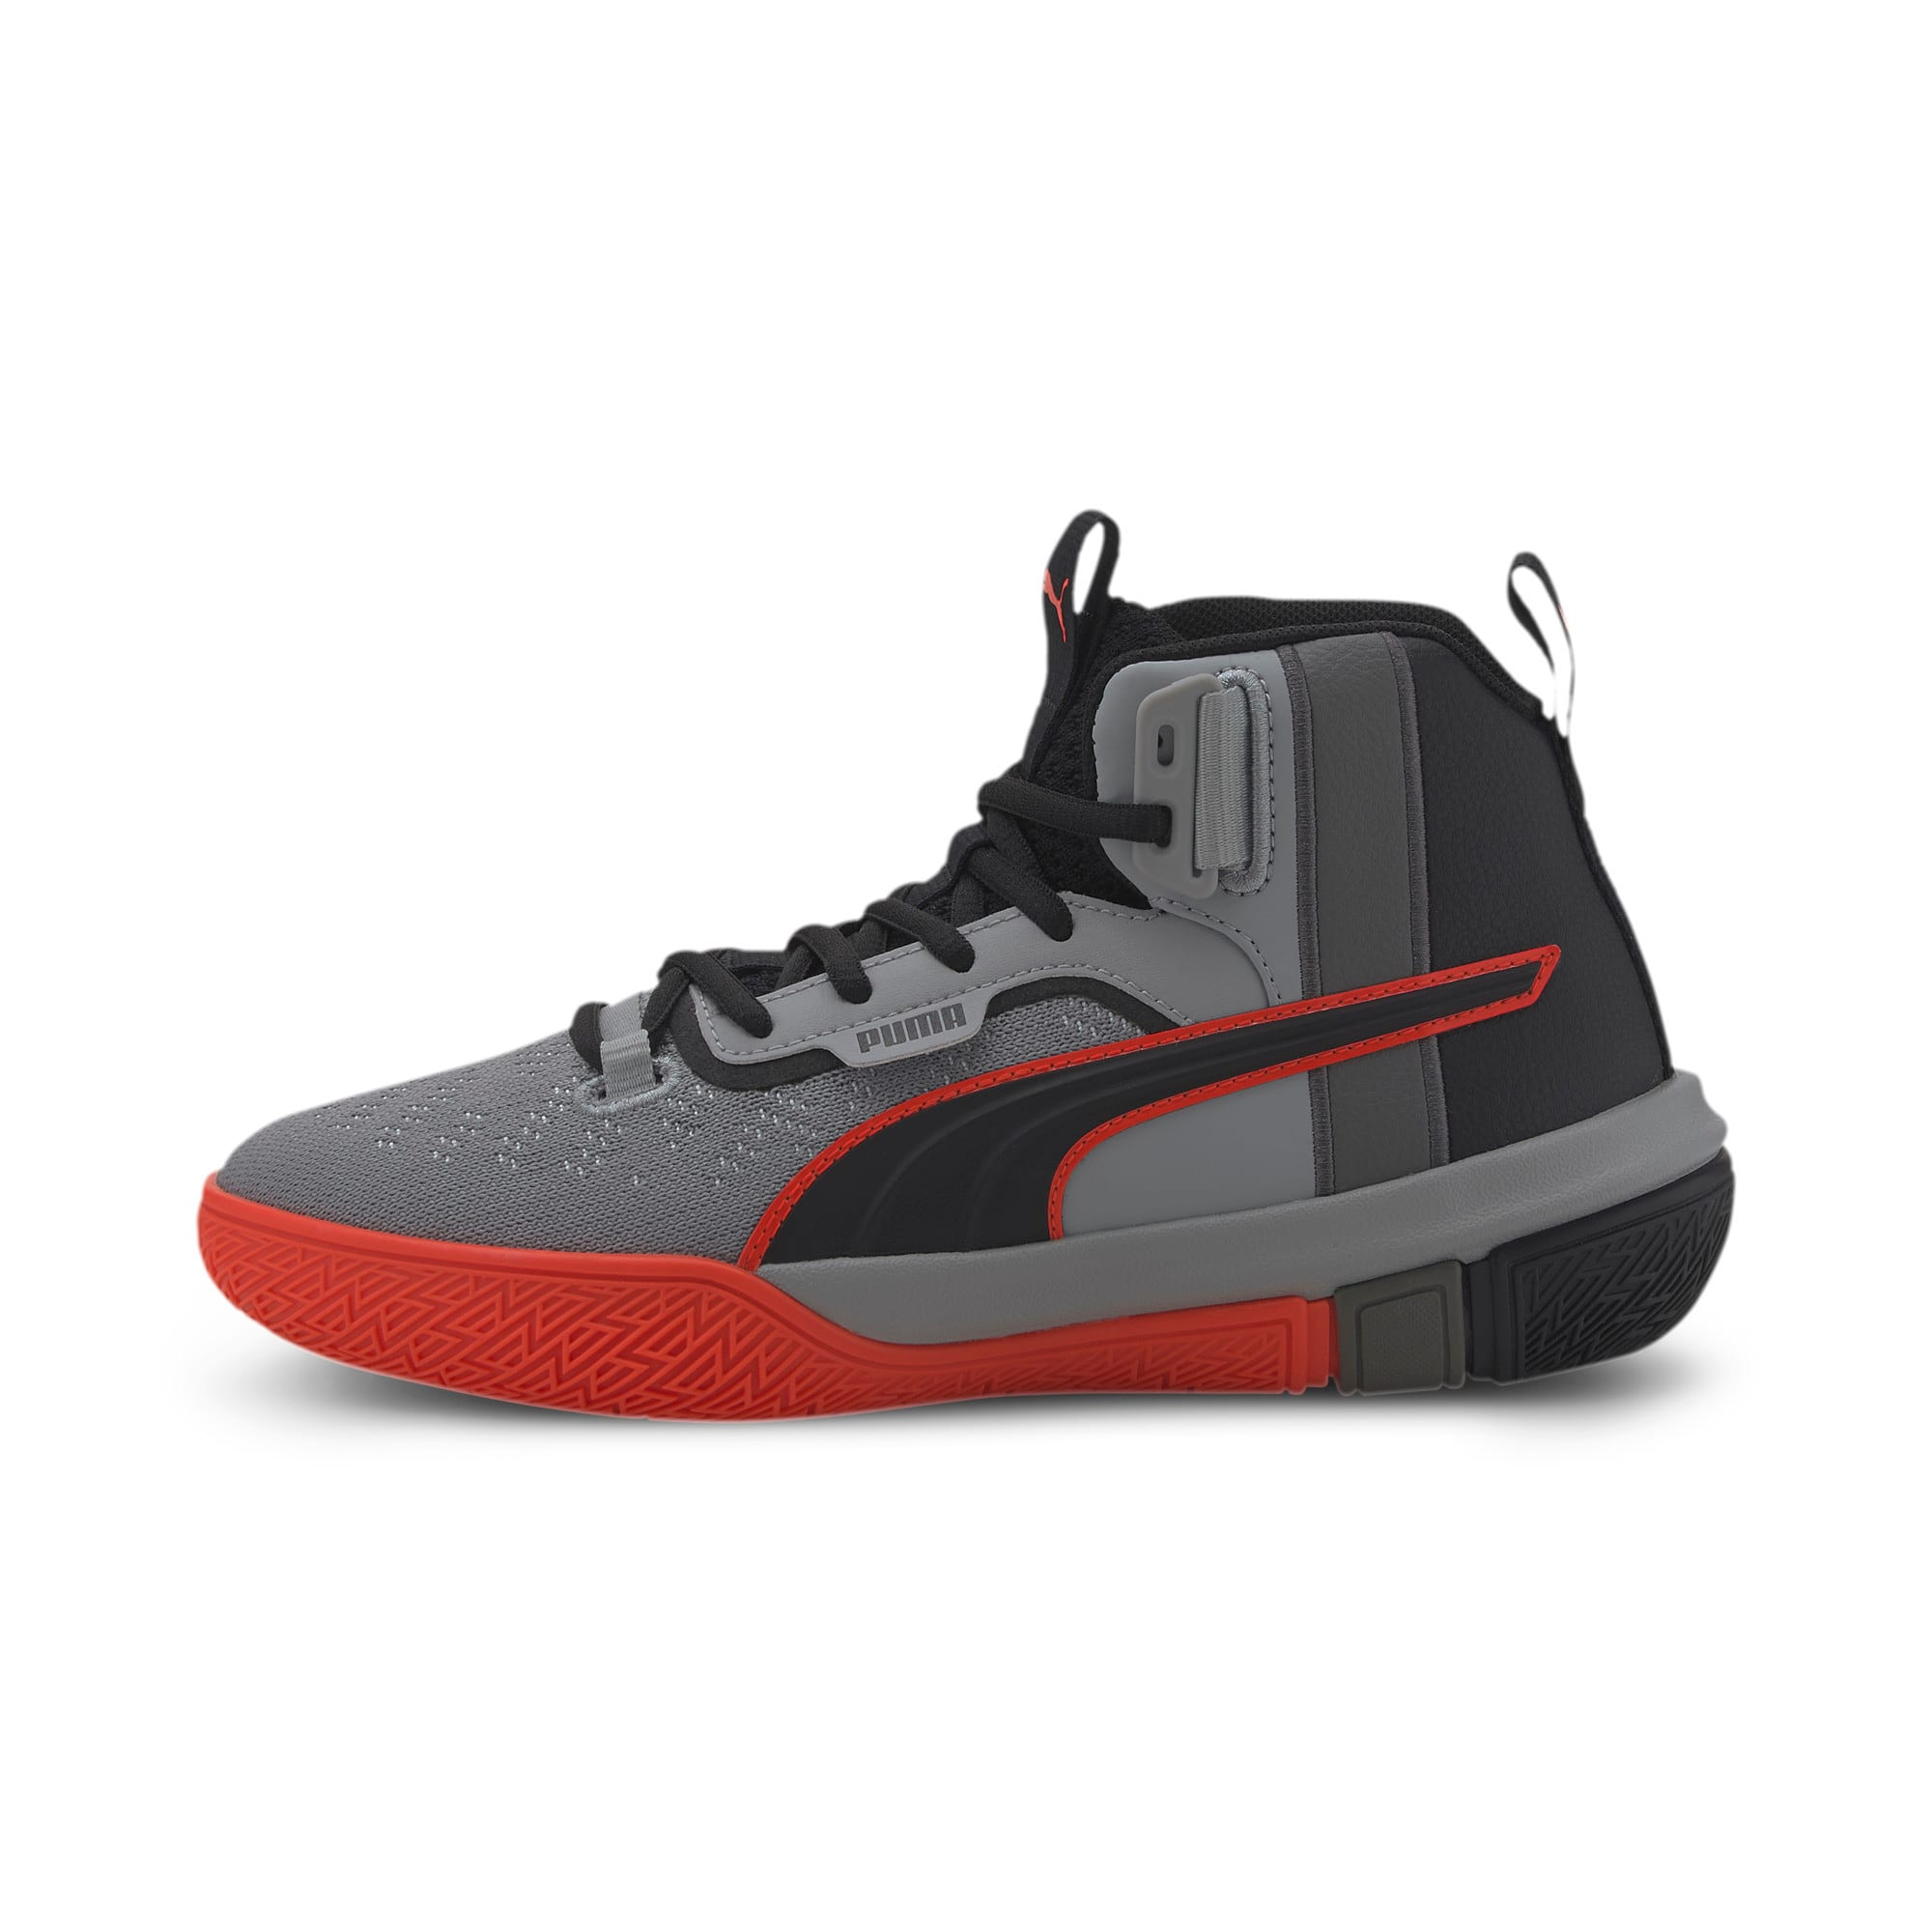 Thumbnail 1 of Legacy Disrupt Basketball Shoes JR, Puma Black-Red Blast, medium